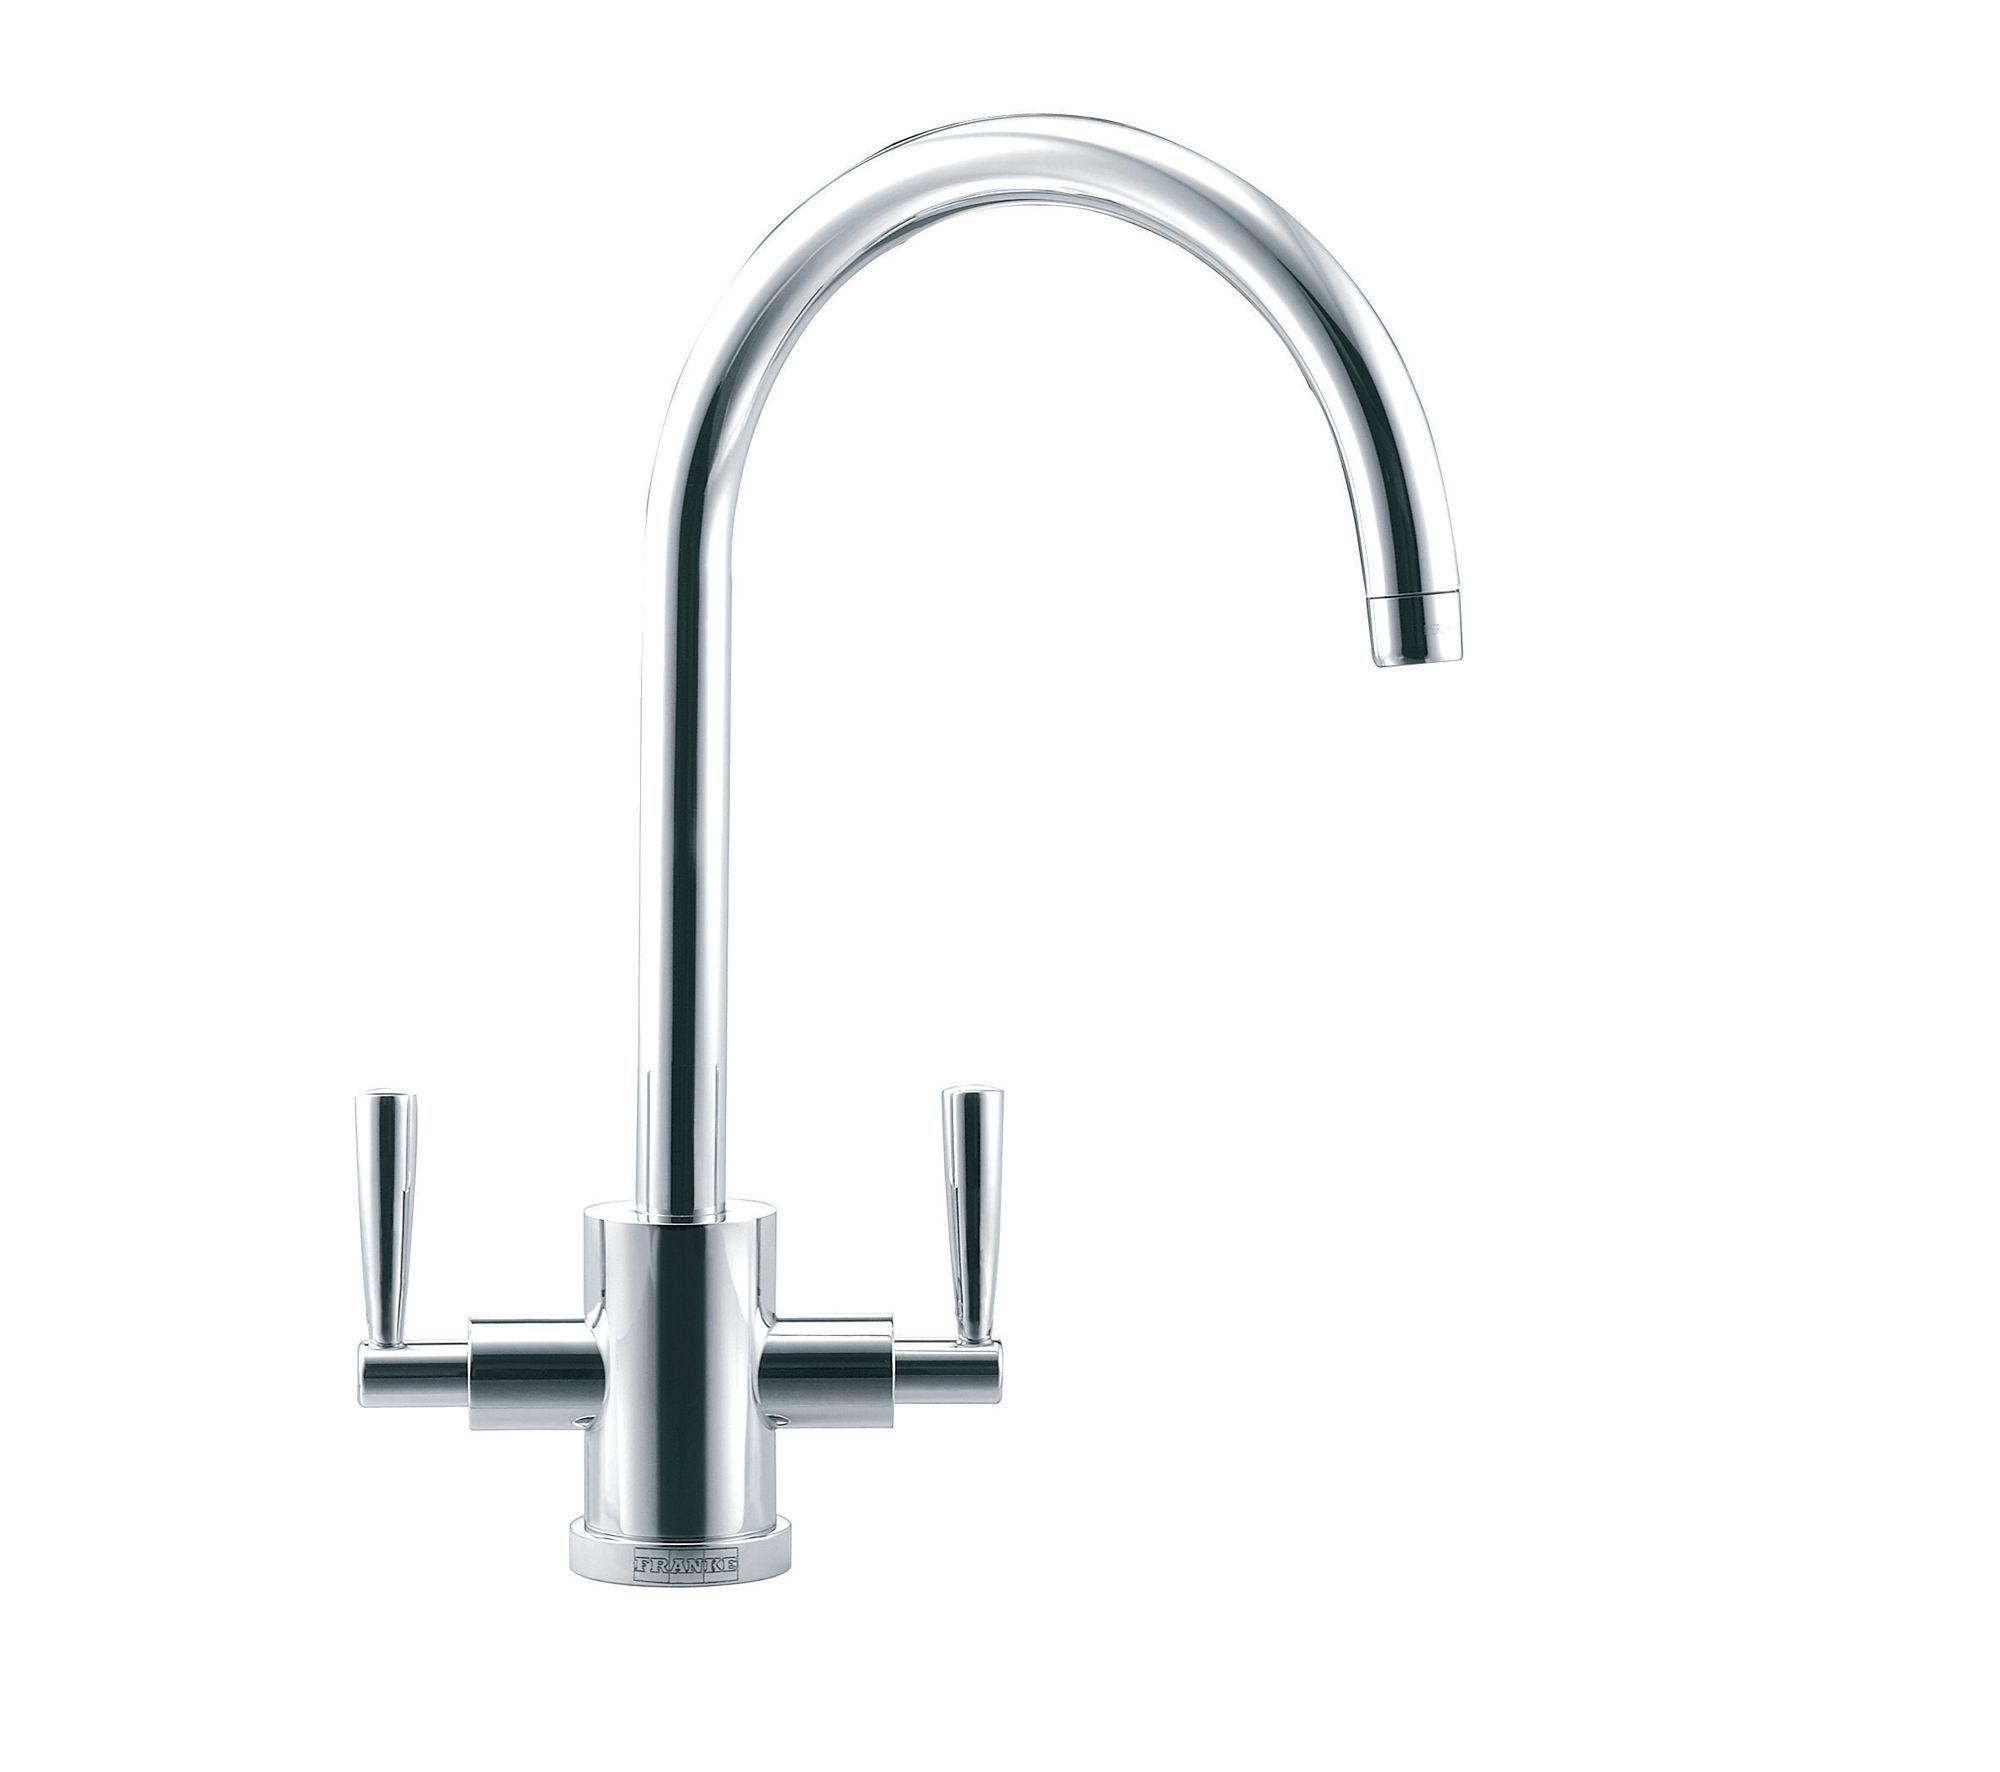 Low Hot Water Pressure In Kitchen Mixer Tap